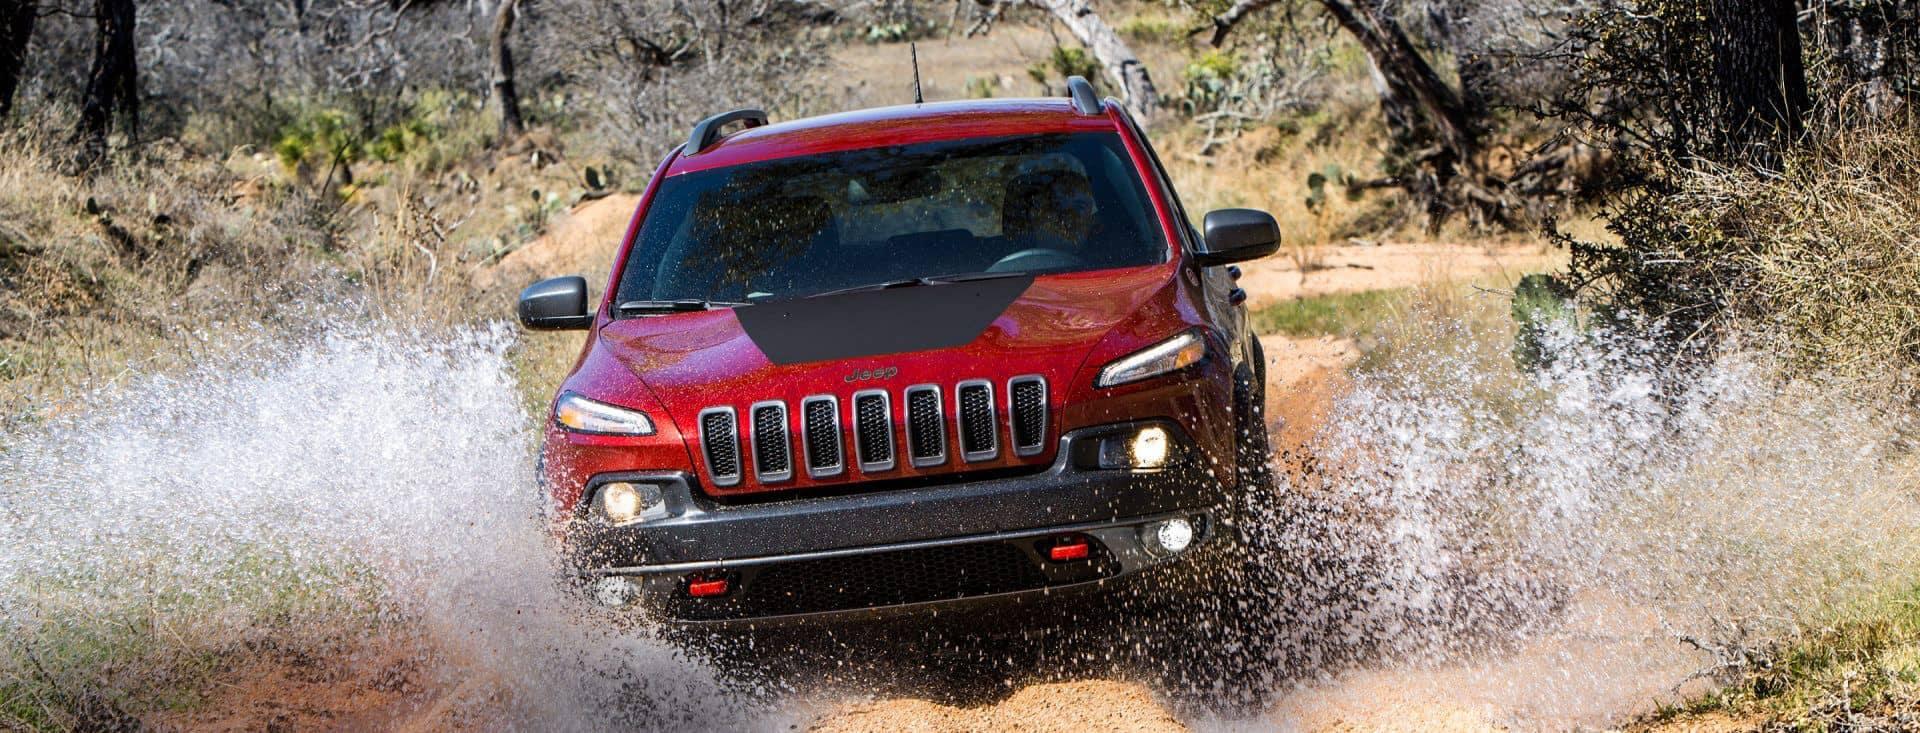 2018 Jeep Cherokee wades through water